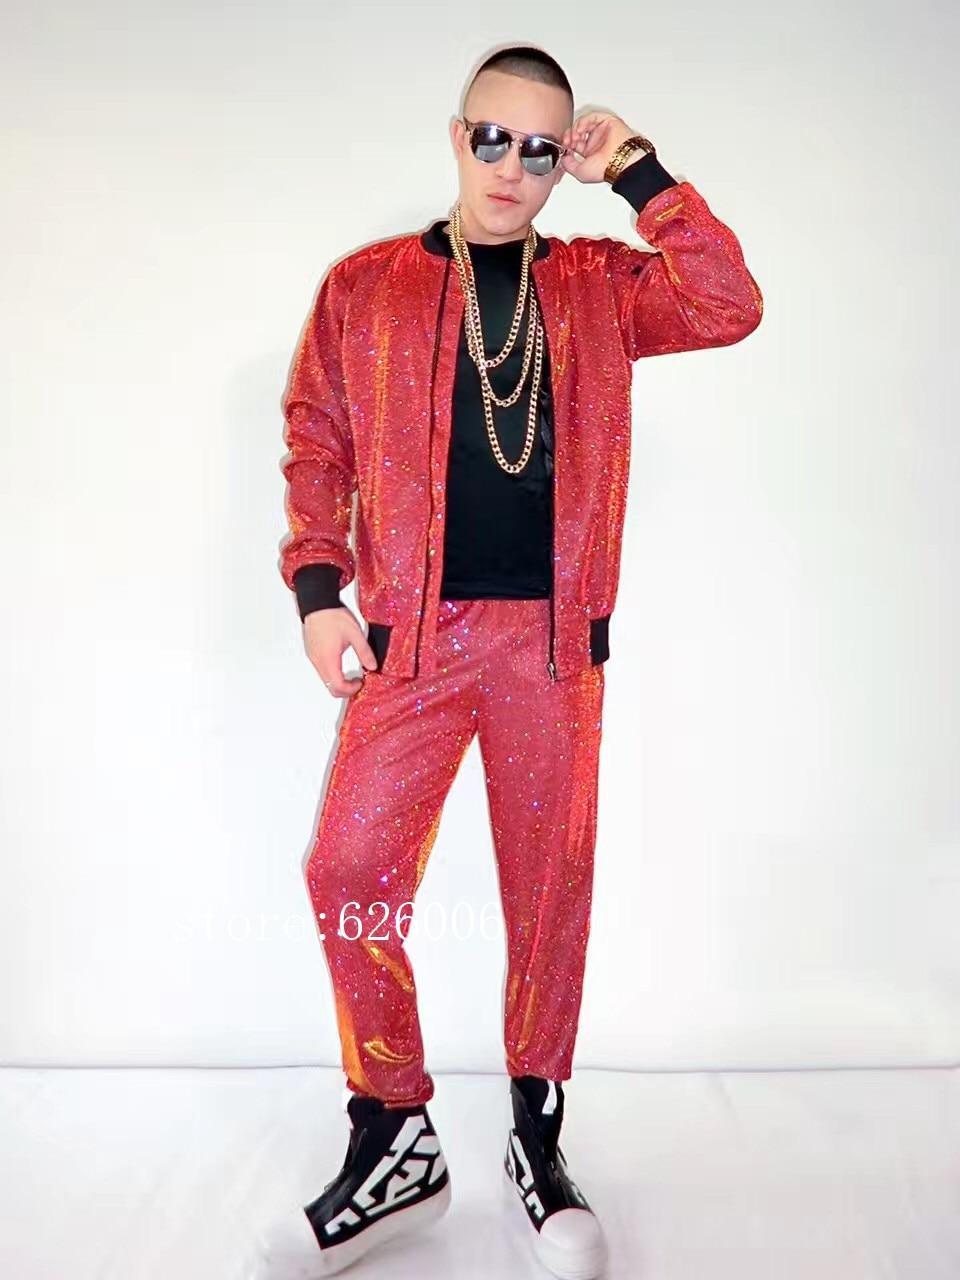 Nightclub Male Singer DJ dancer costumes red gold flash powder hip hop baseball jacket pants stage show party performance set